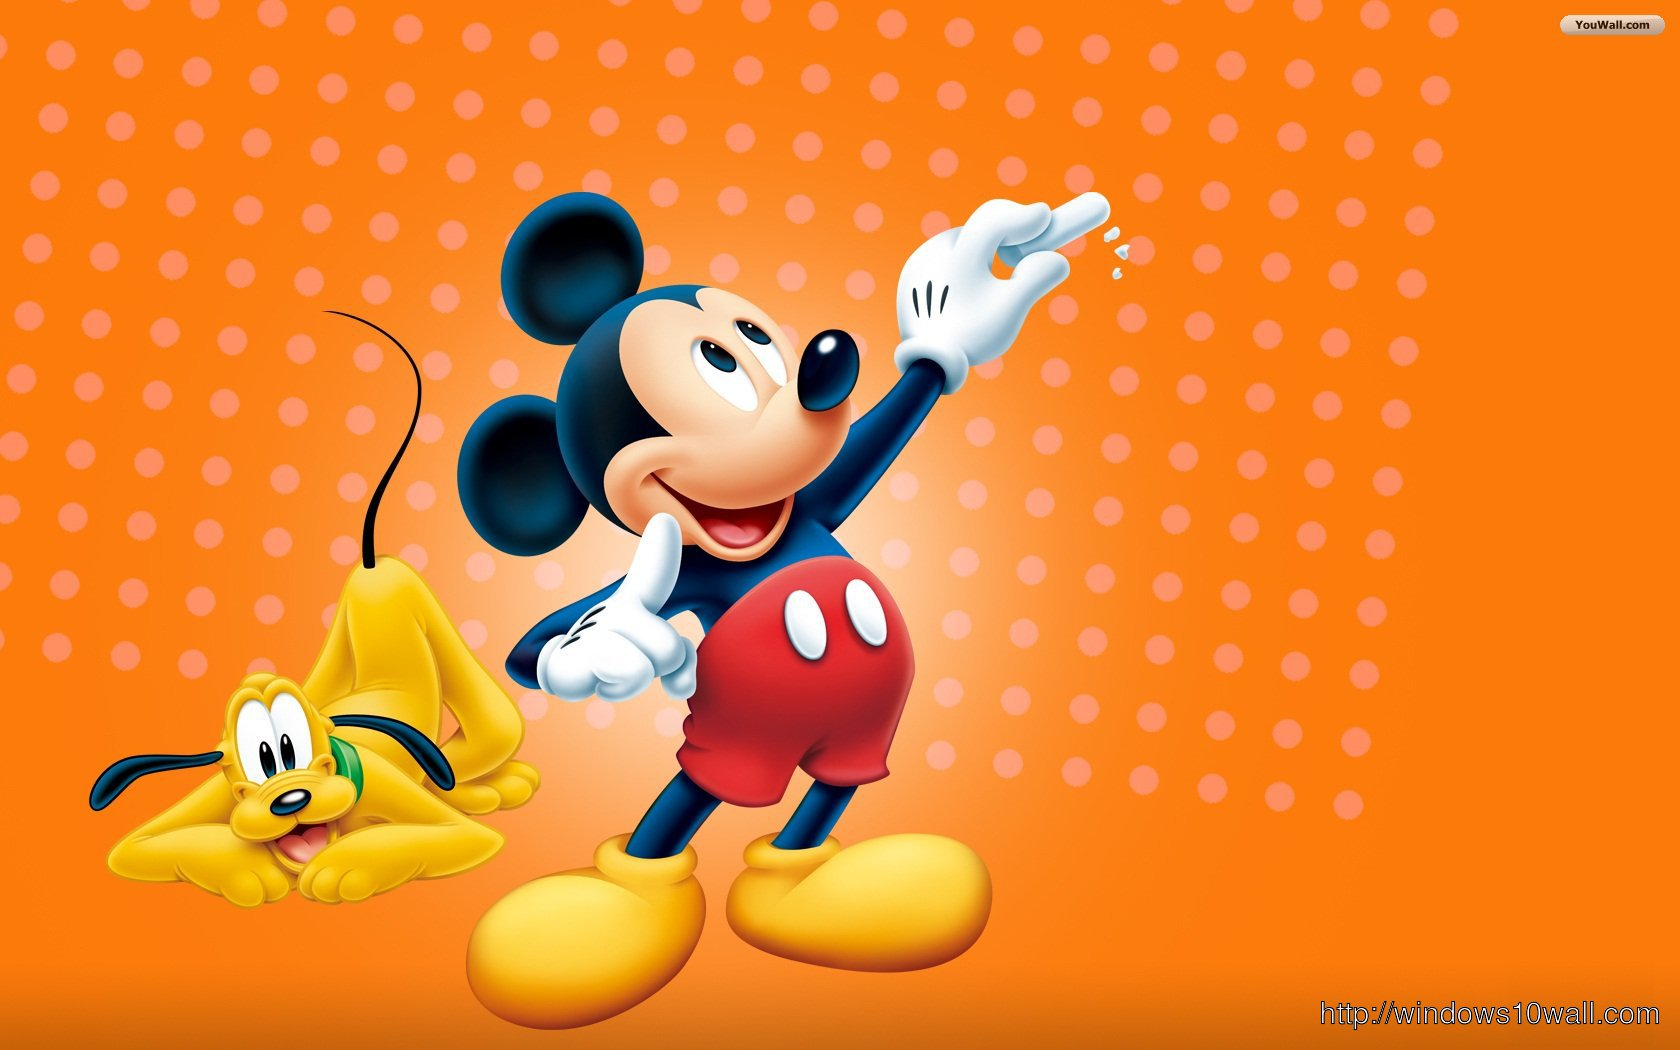 Disney Mickey Mouse Desktop Background Wallpaper